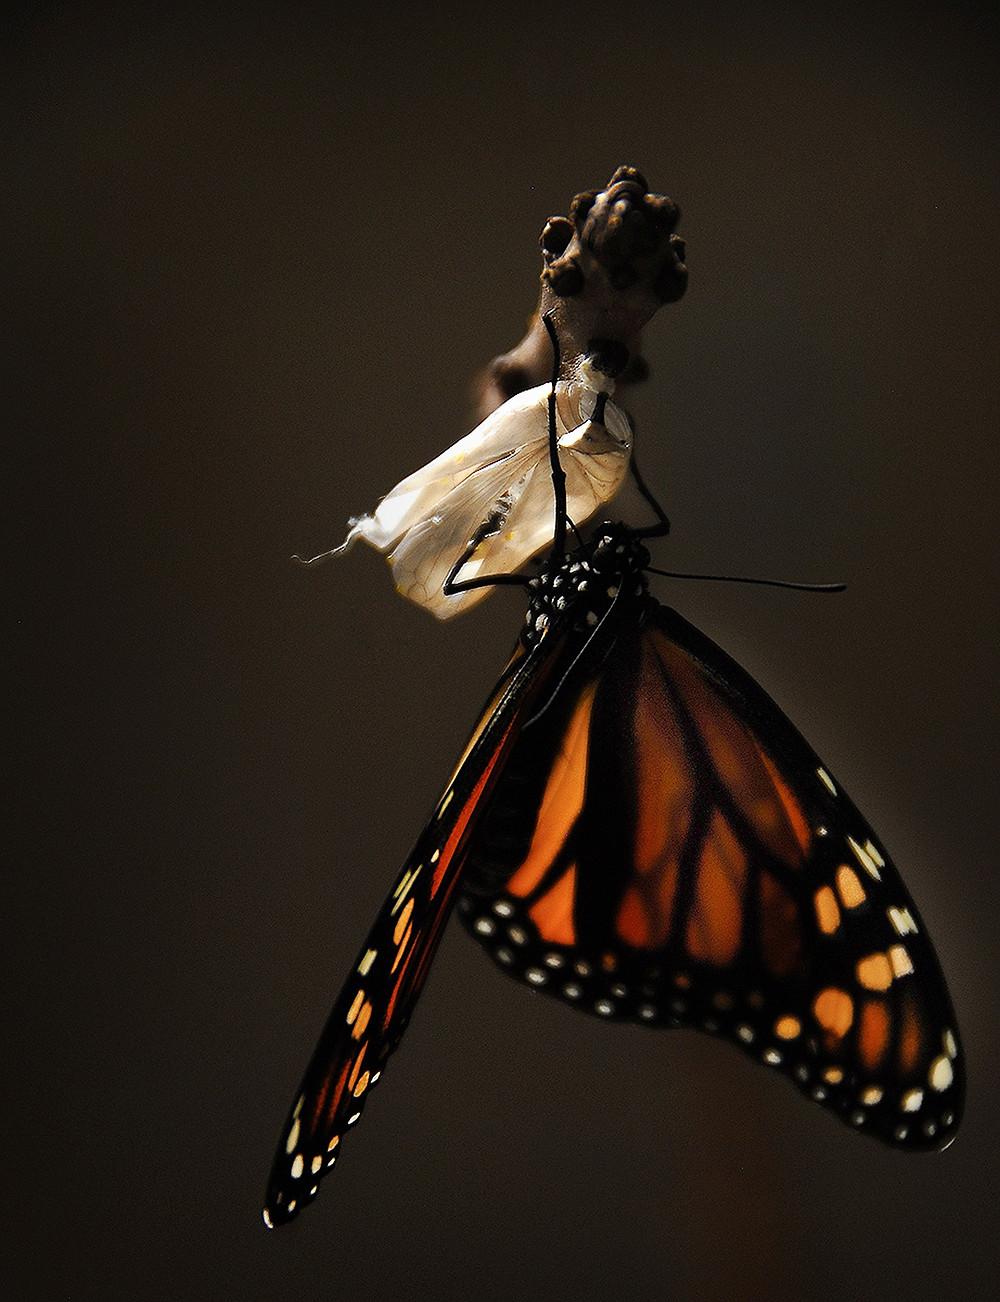 Borboleta e lagarta, Pixabay